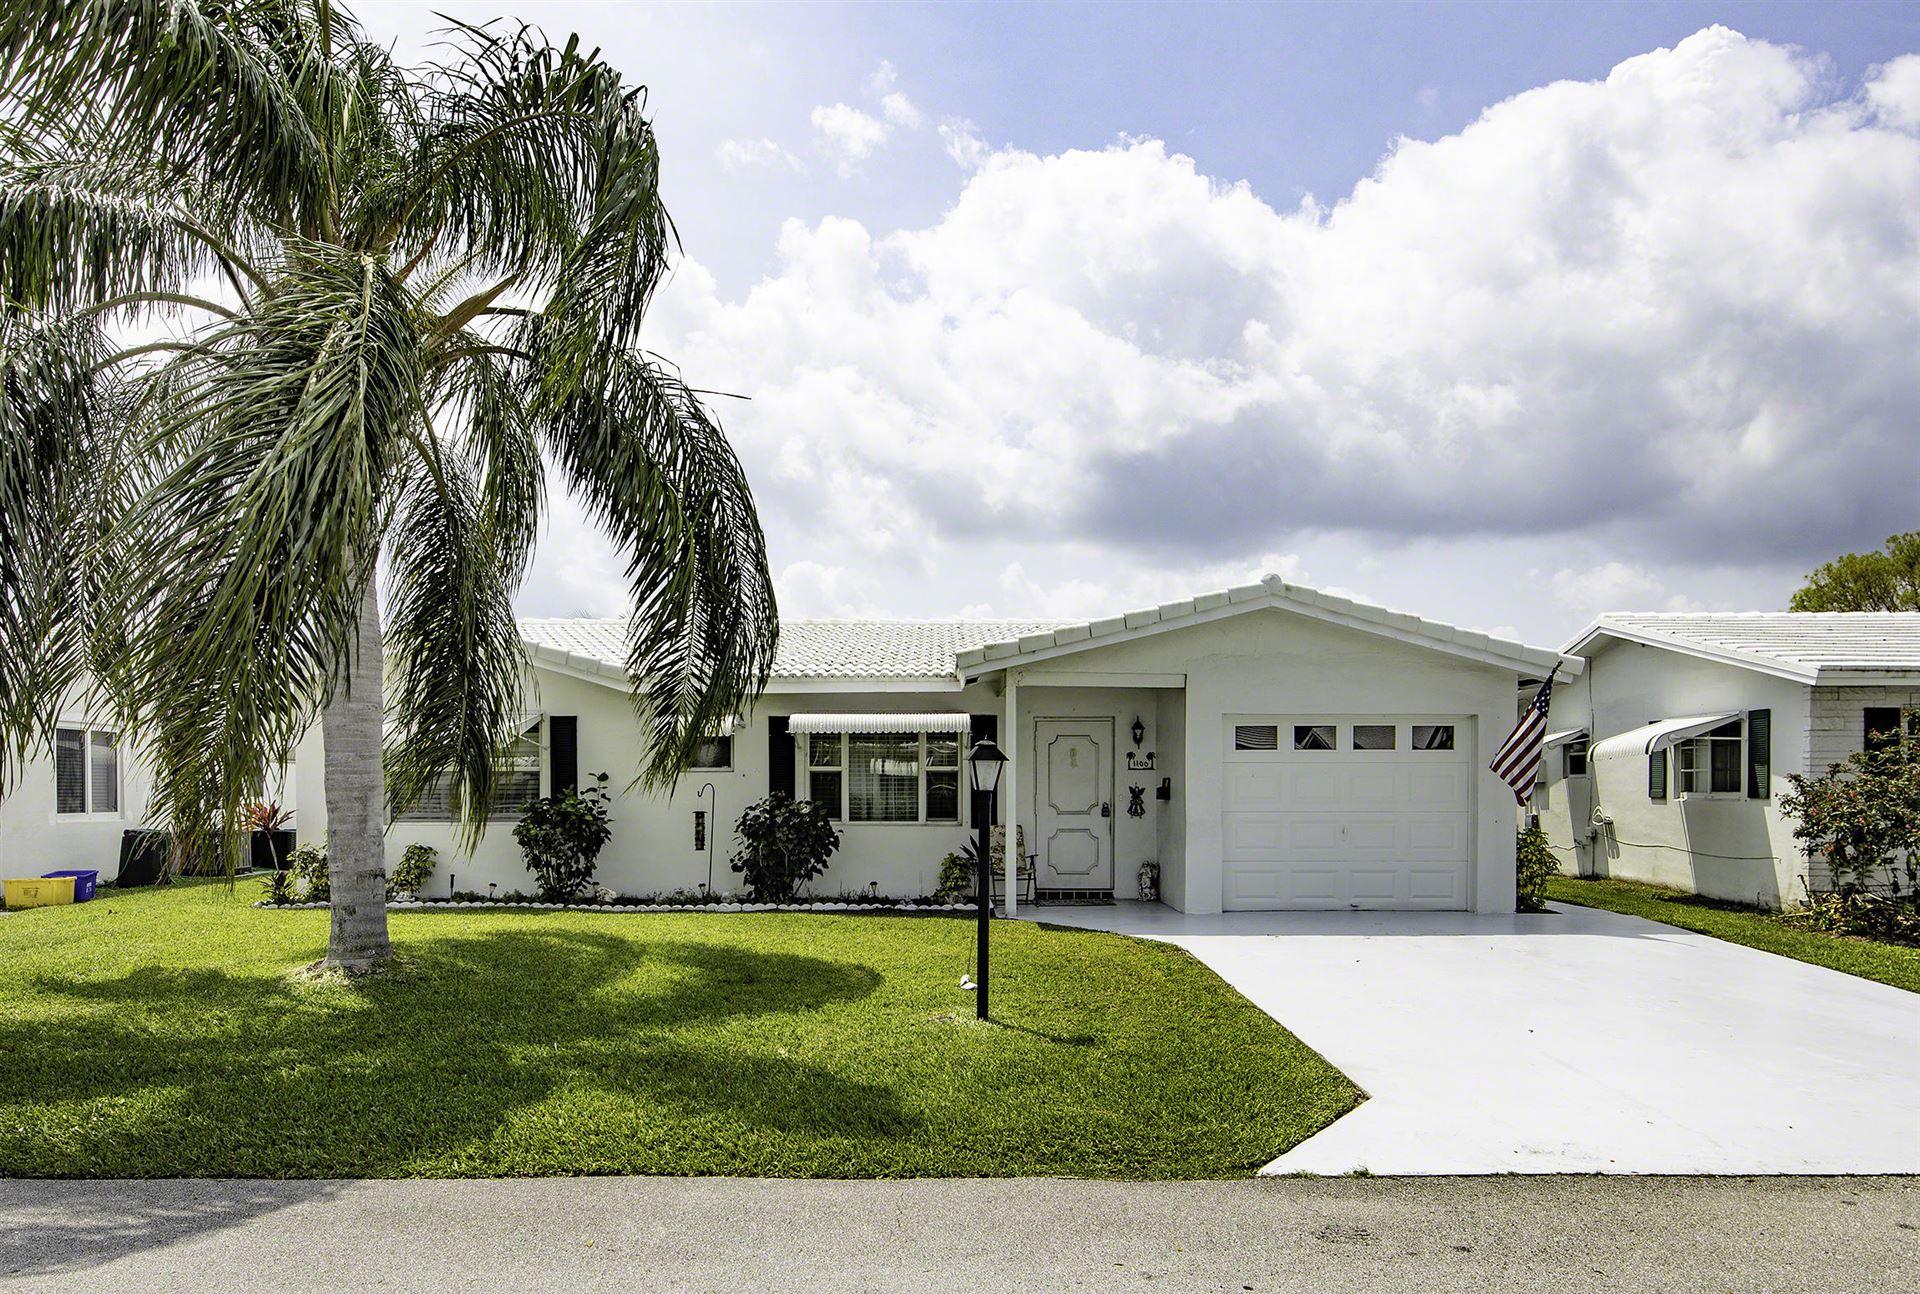 1100 Leisure Lane, Boynton Beach, FL 33426 - #: RX-10616942